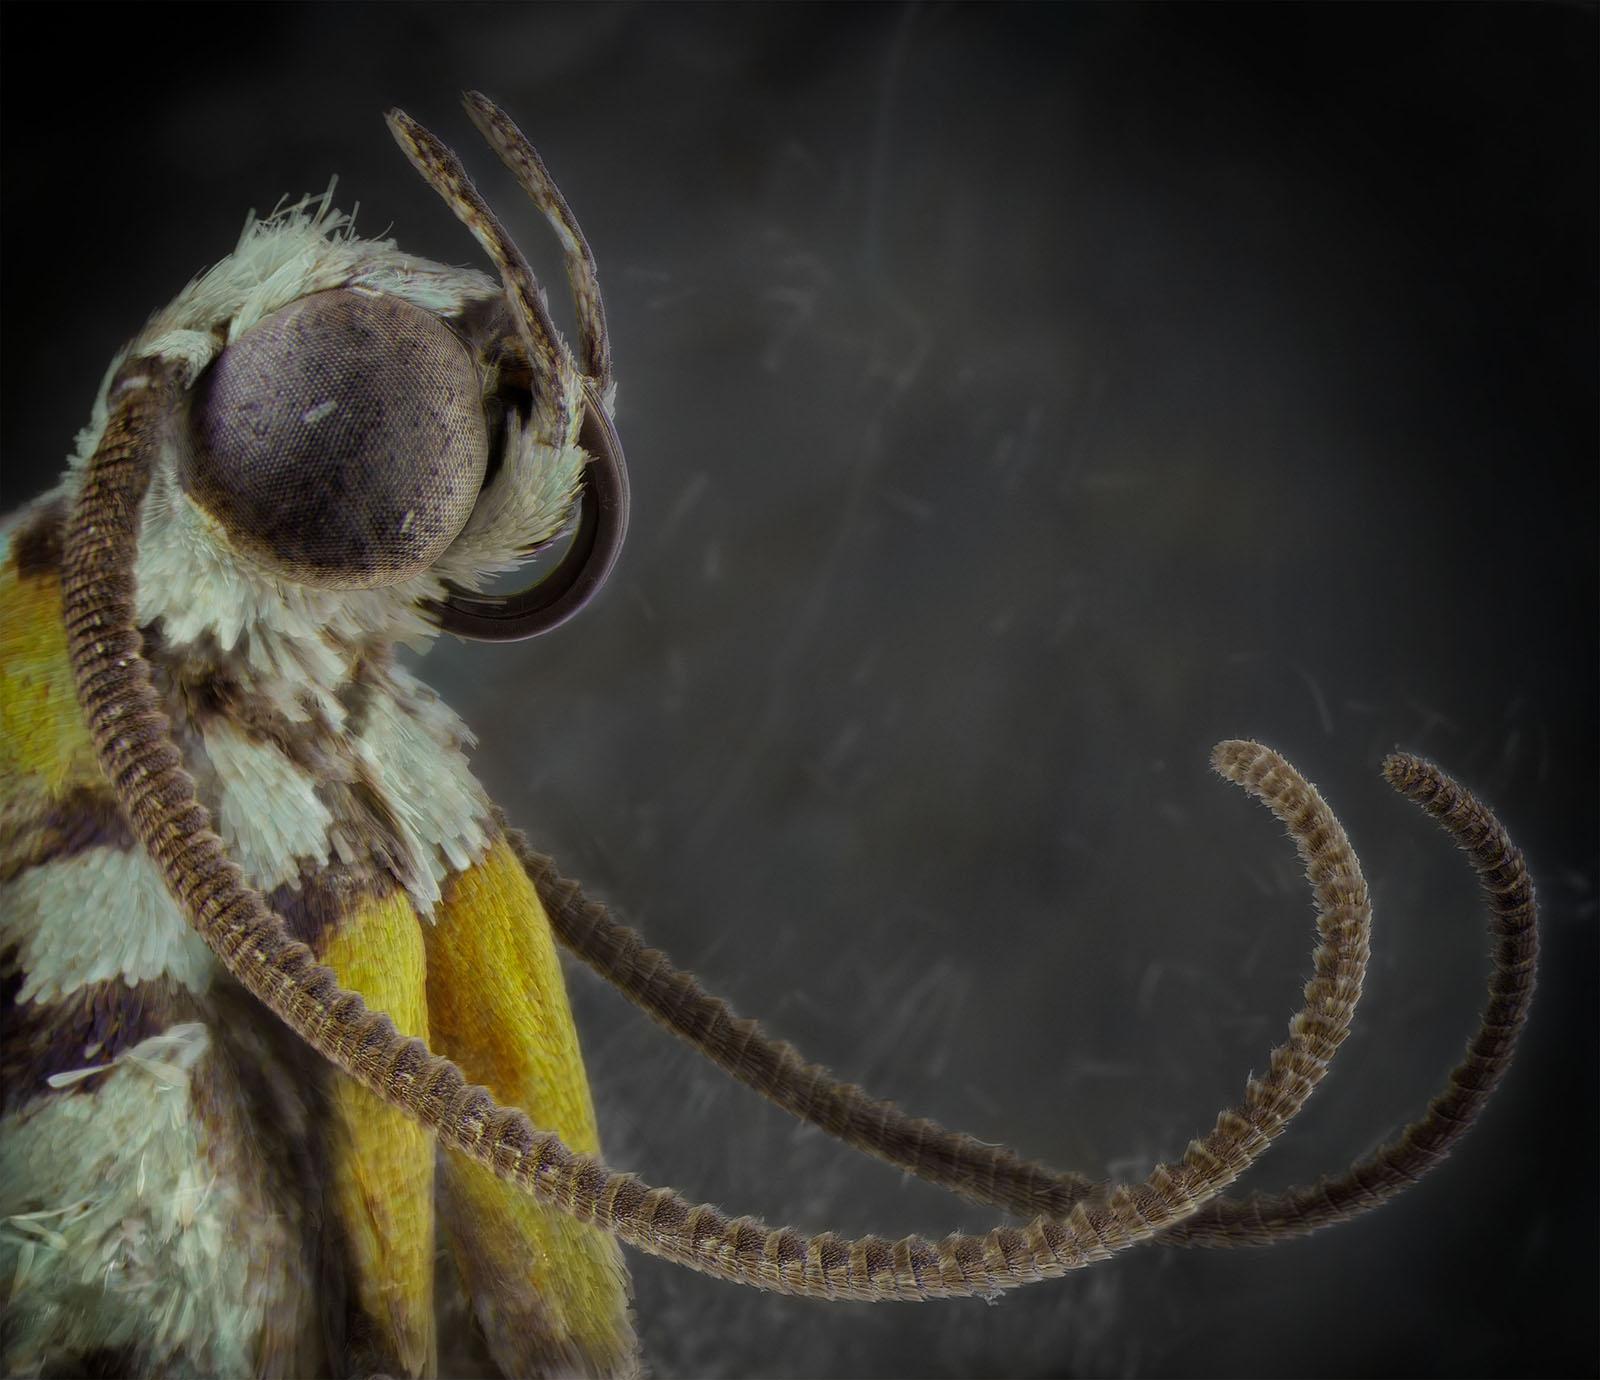 Backyard Shed Window, July 7th [Ailanthus Webworm Moth],2017 © Daniel Kariko